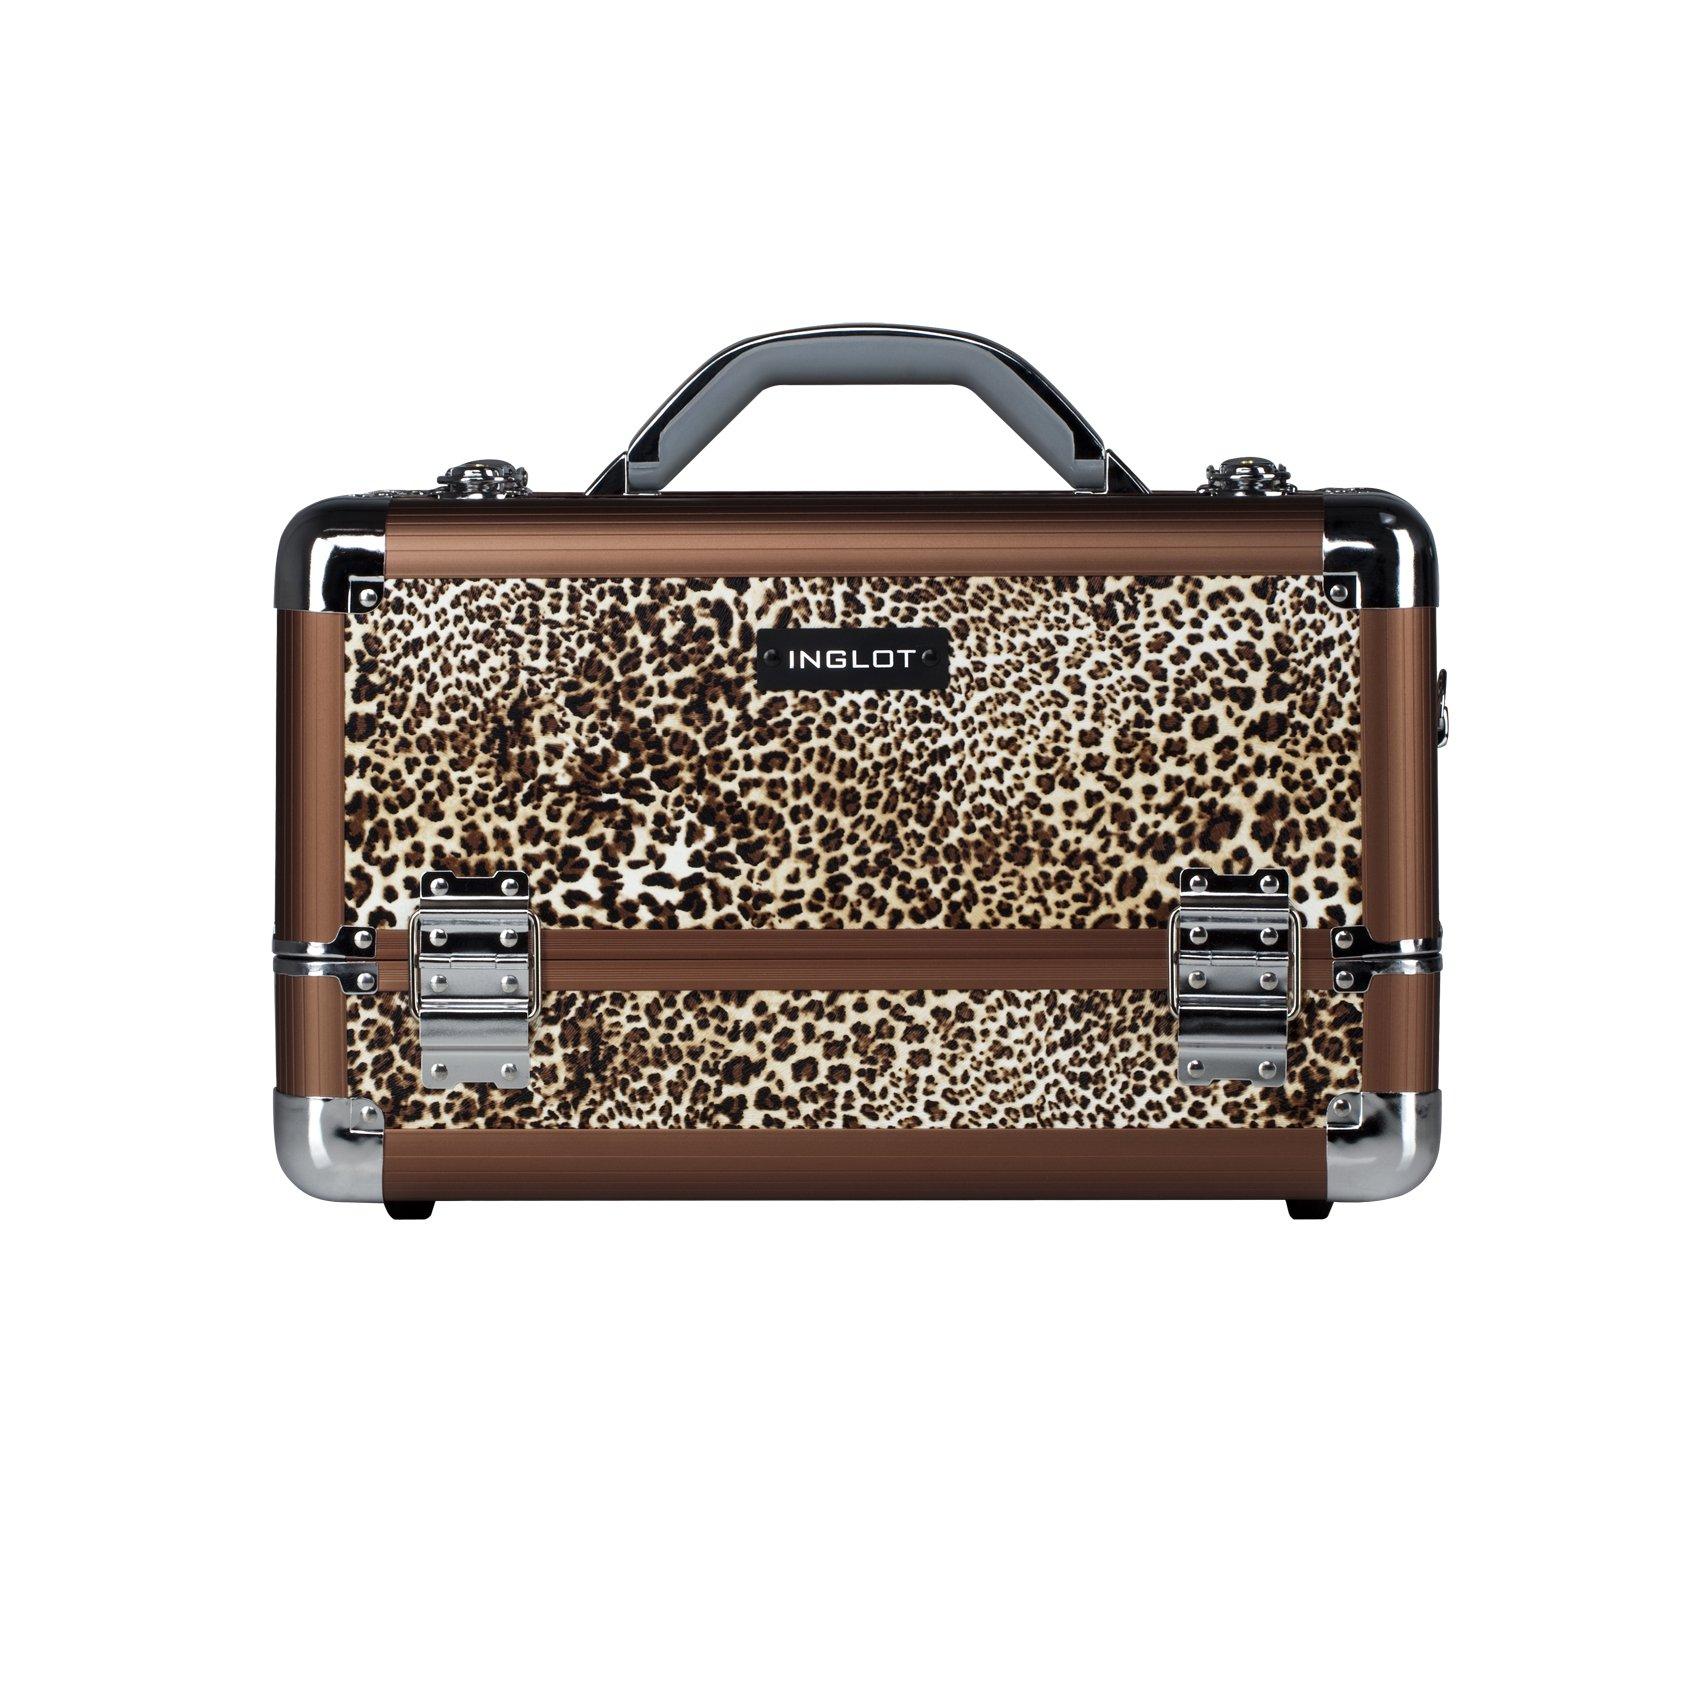 Inglot Inglot Makeup Case Leaopard Leather Pattern Kc-M34 by Inglot